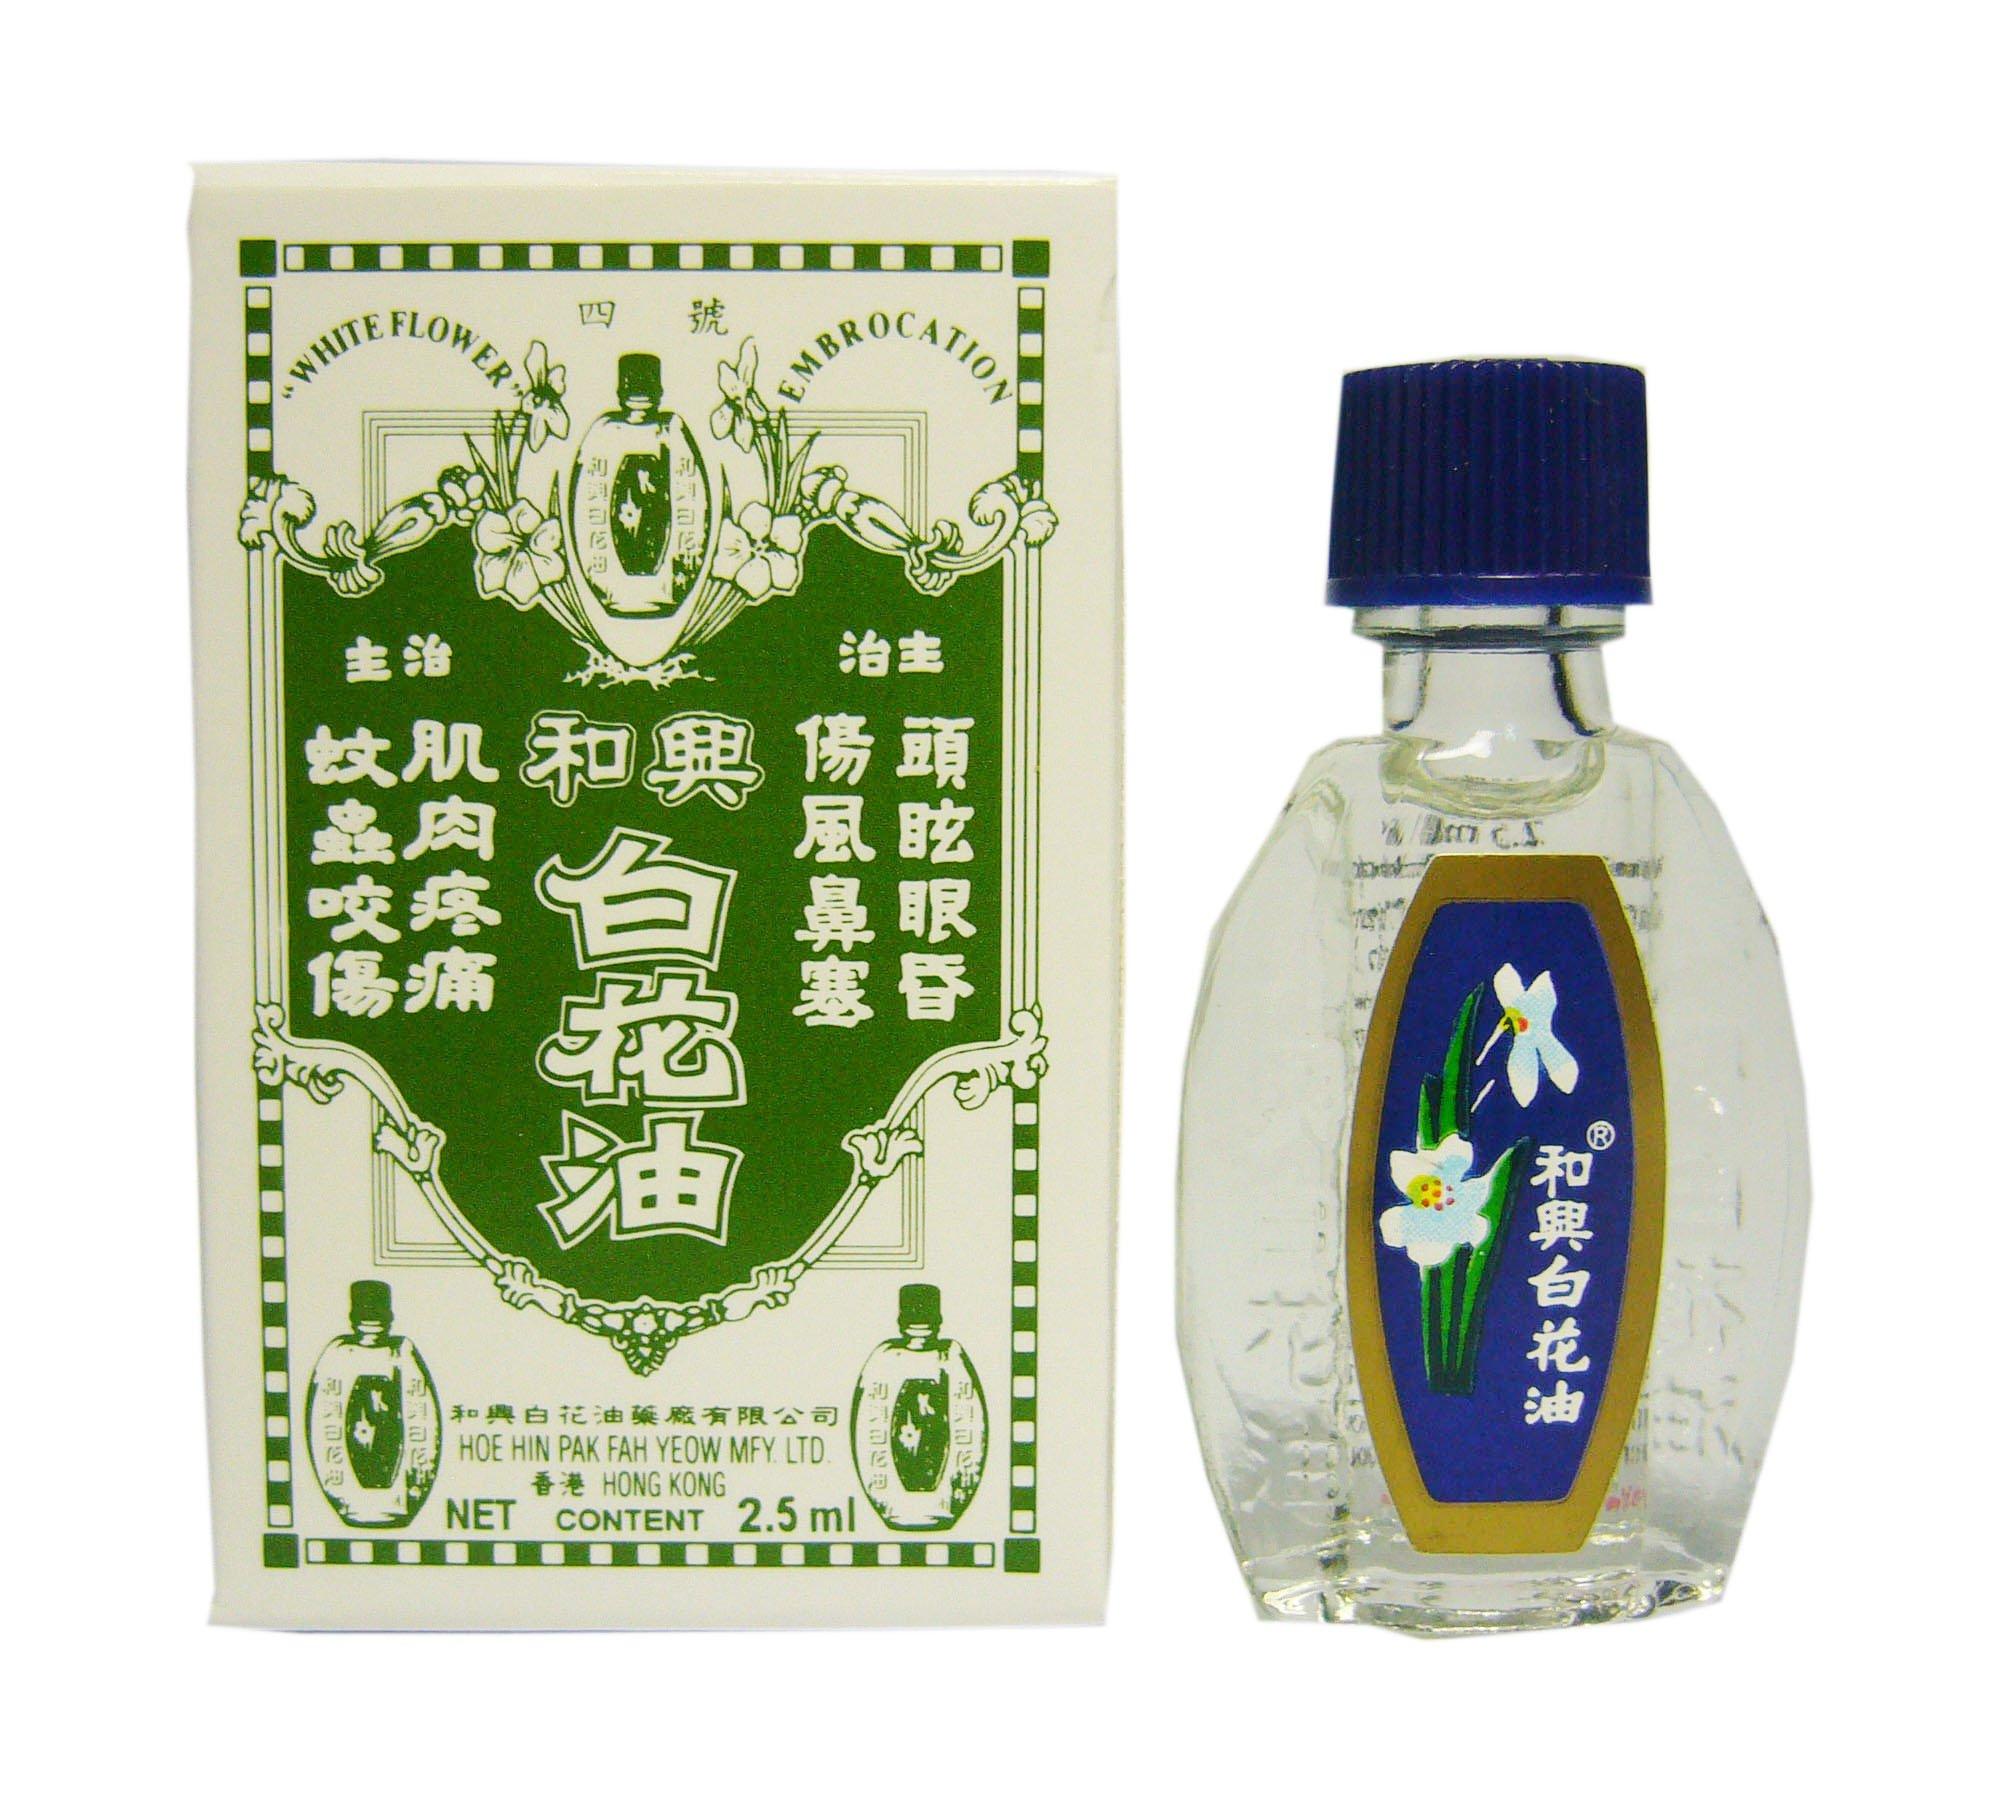 Amazon White Flower Embrocation 5 Ml X 2 Bottles Thailand